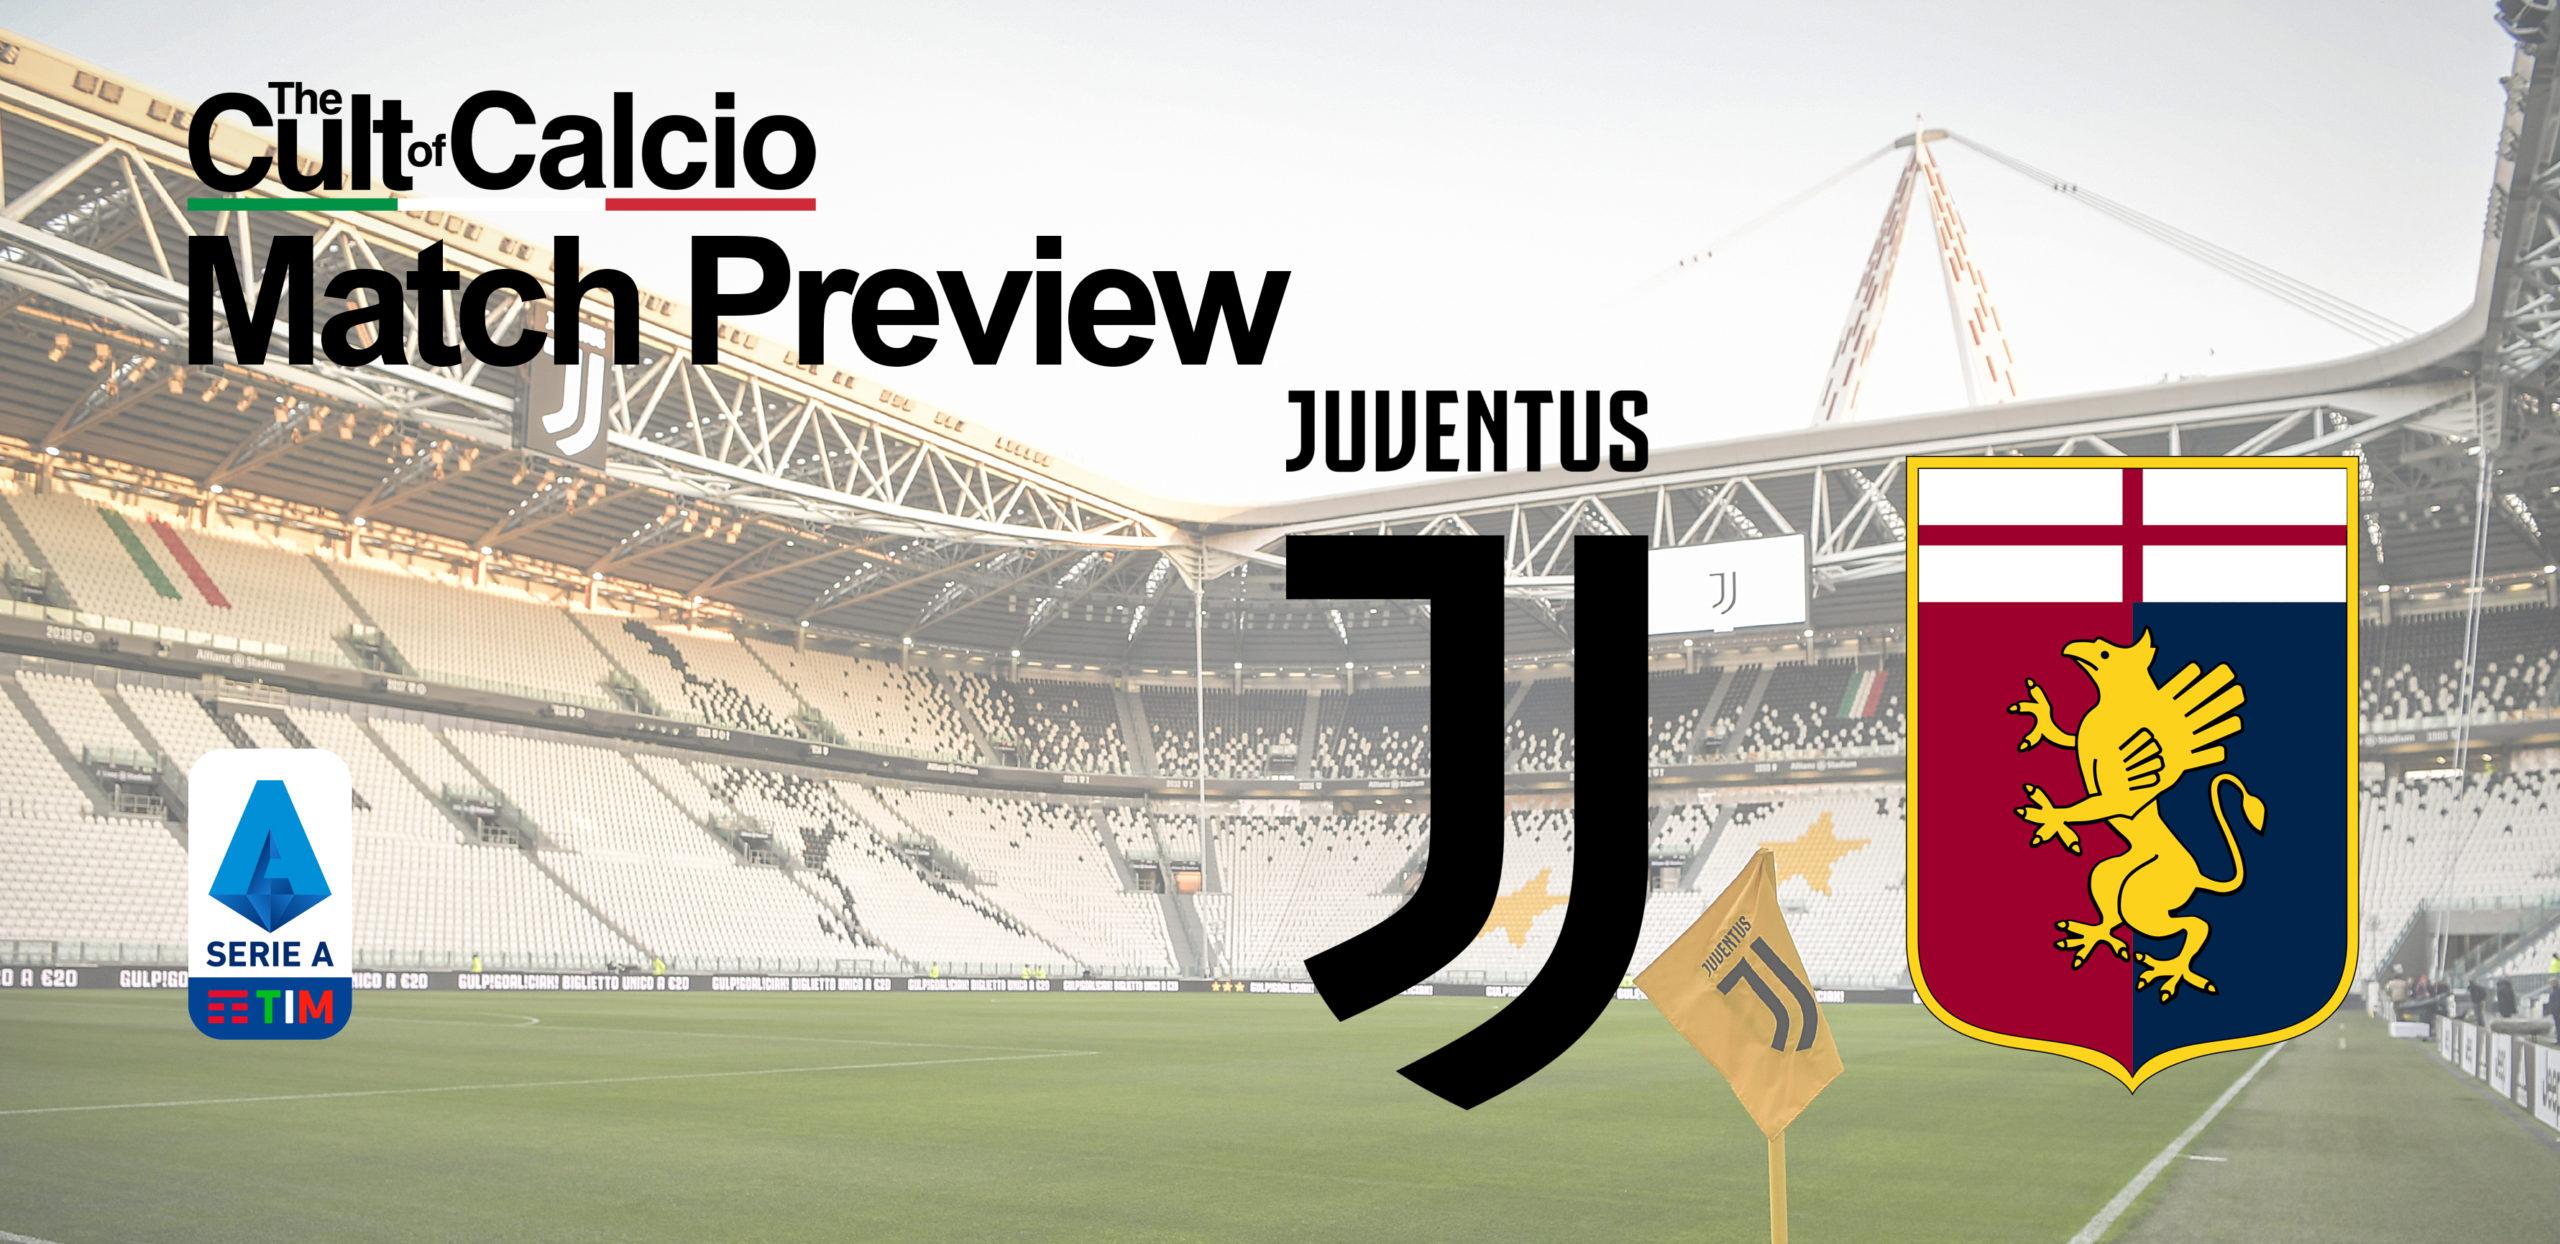 Serie A Round 30 Juventus Genoa Match Preview The Cult Of Calcio